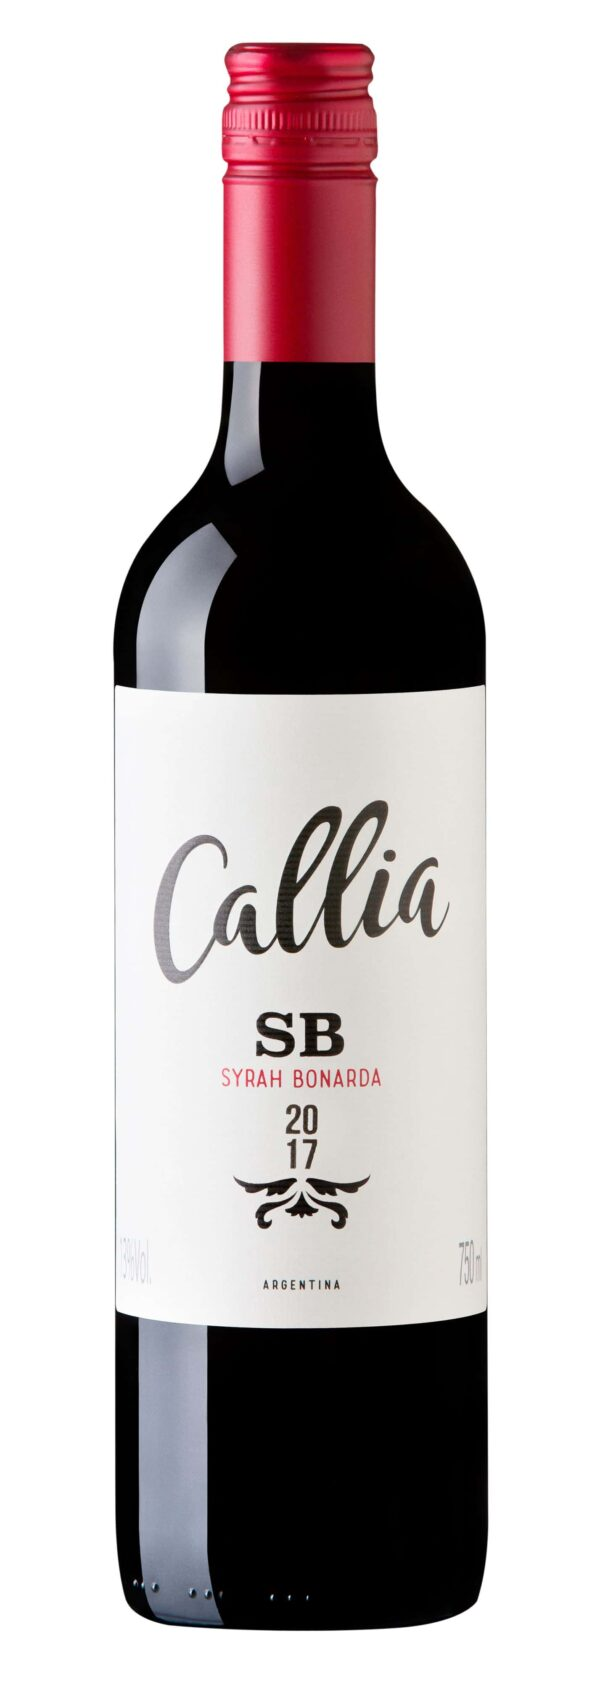 vinho callia syrah bonarda argentino